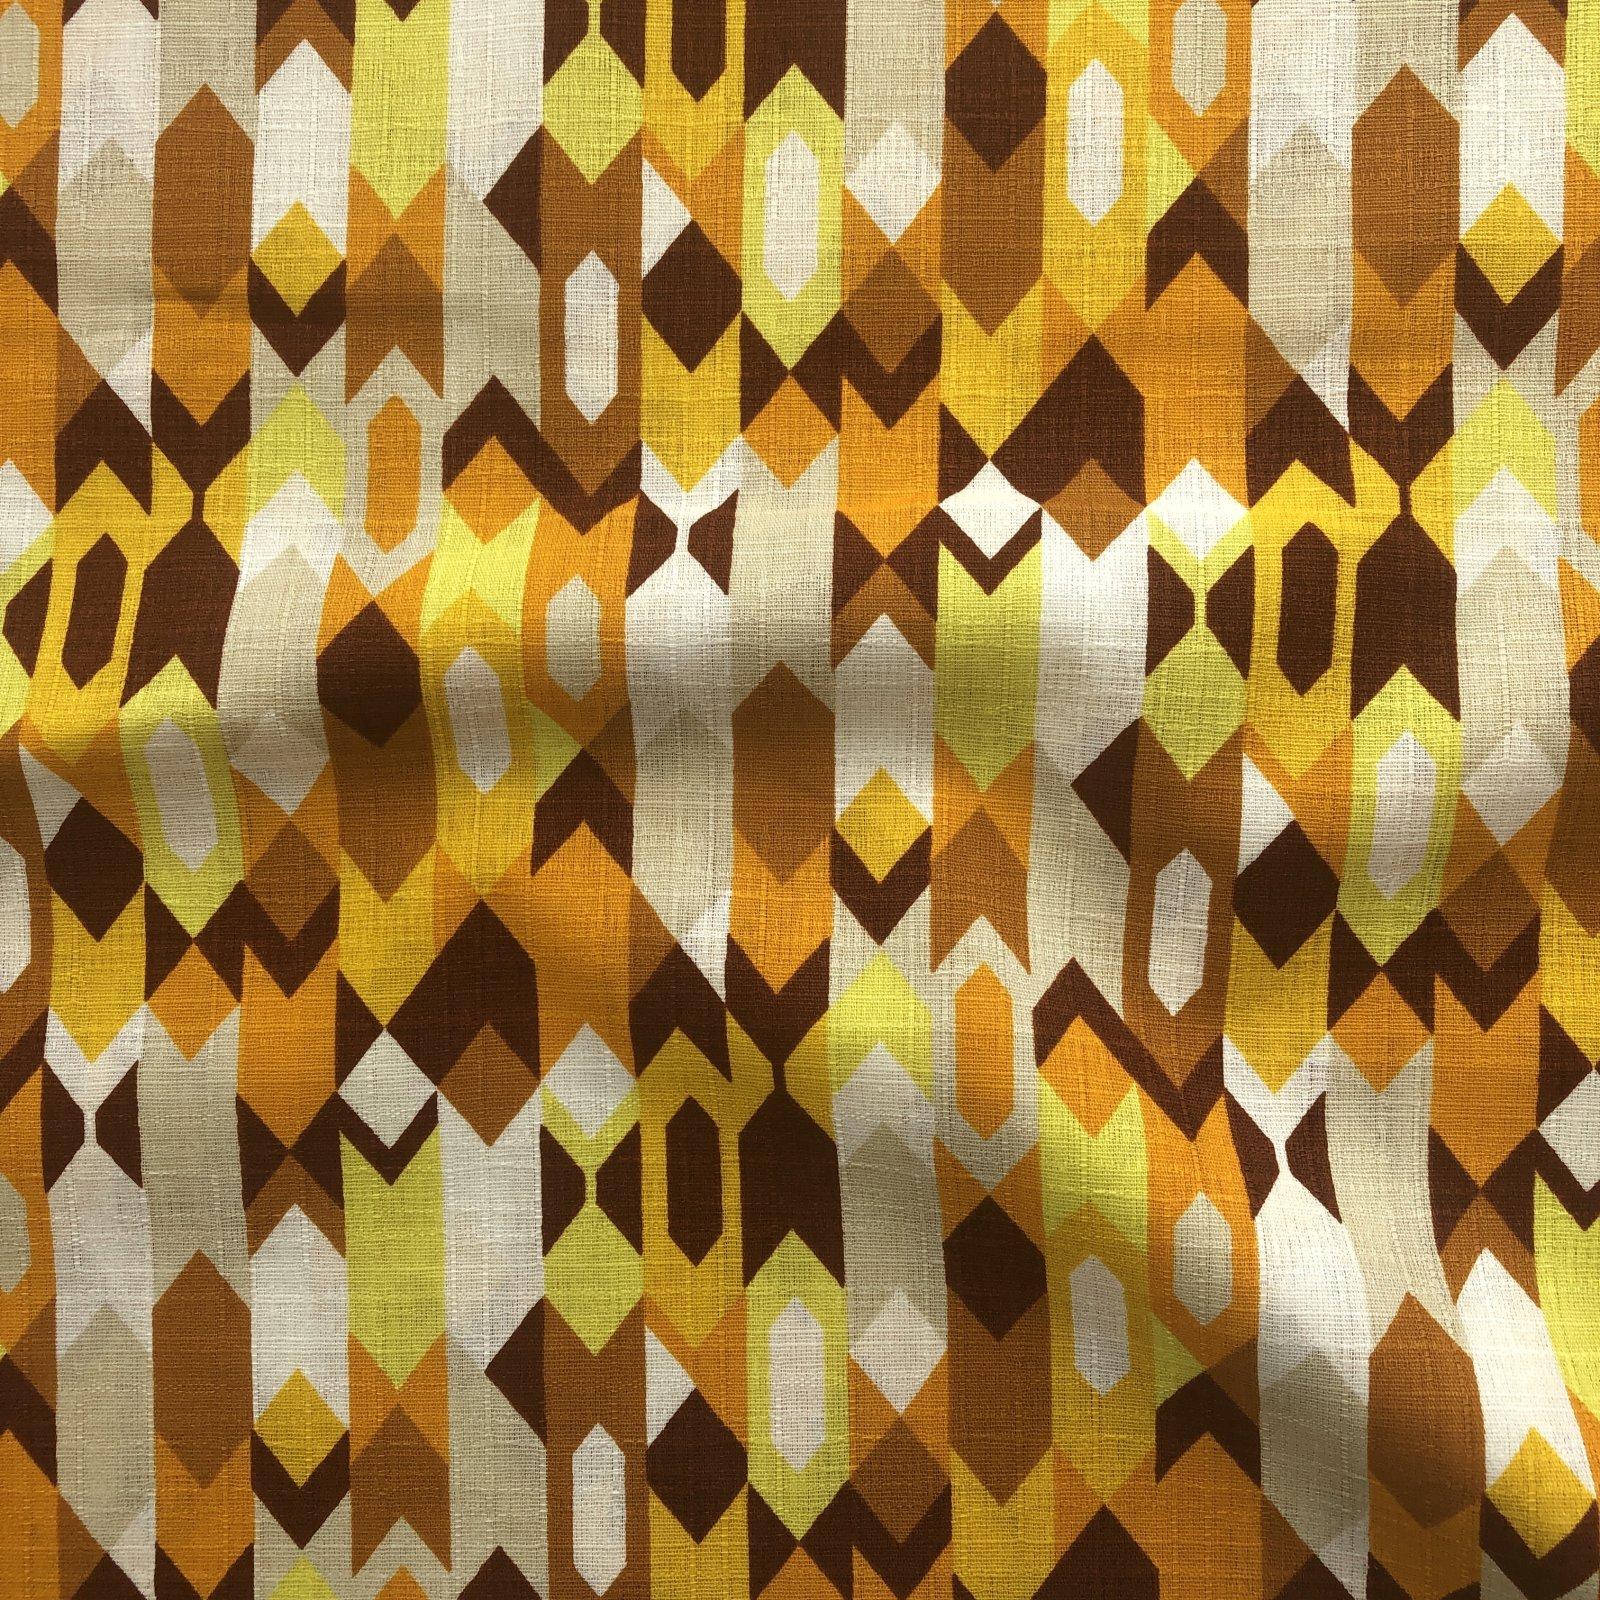 Hokkoh - Cotton Dobby - Golden Arrows